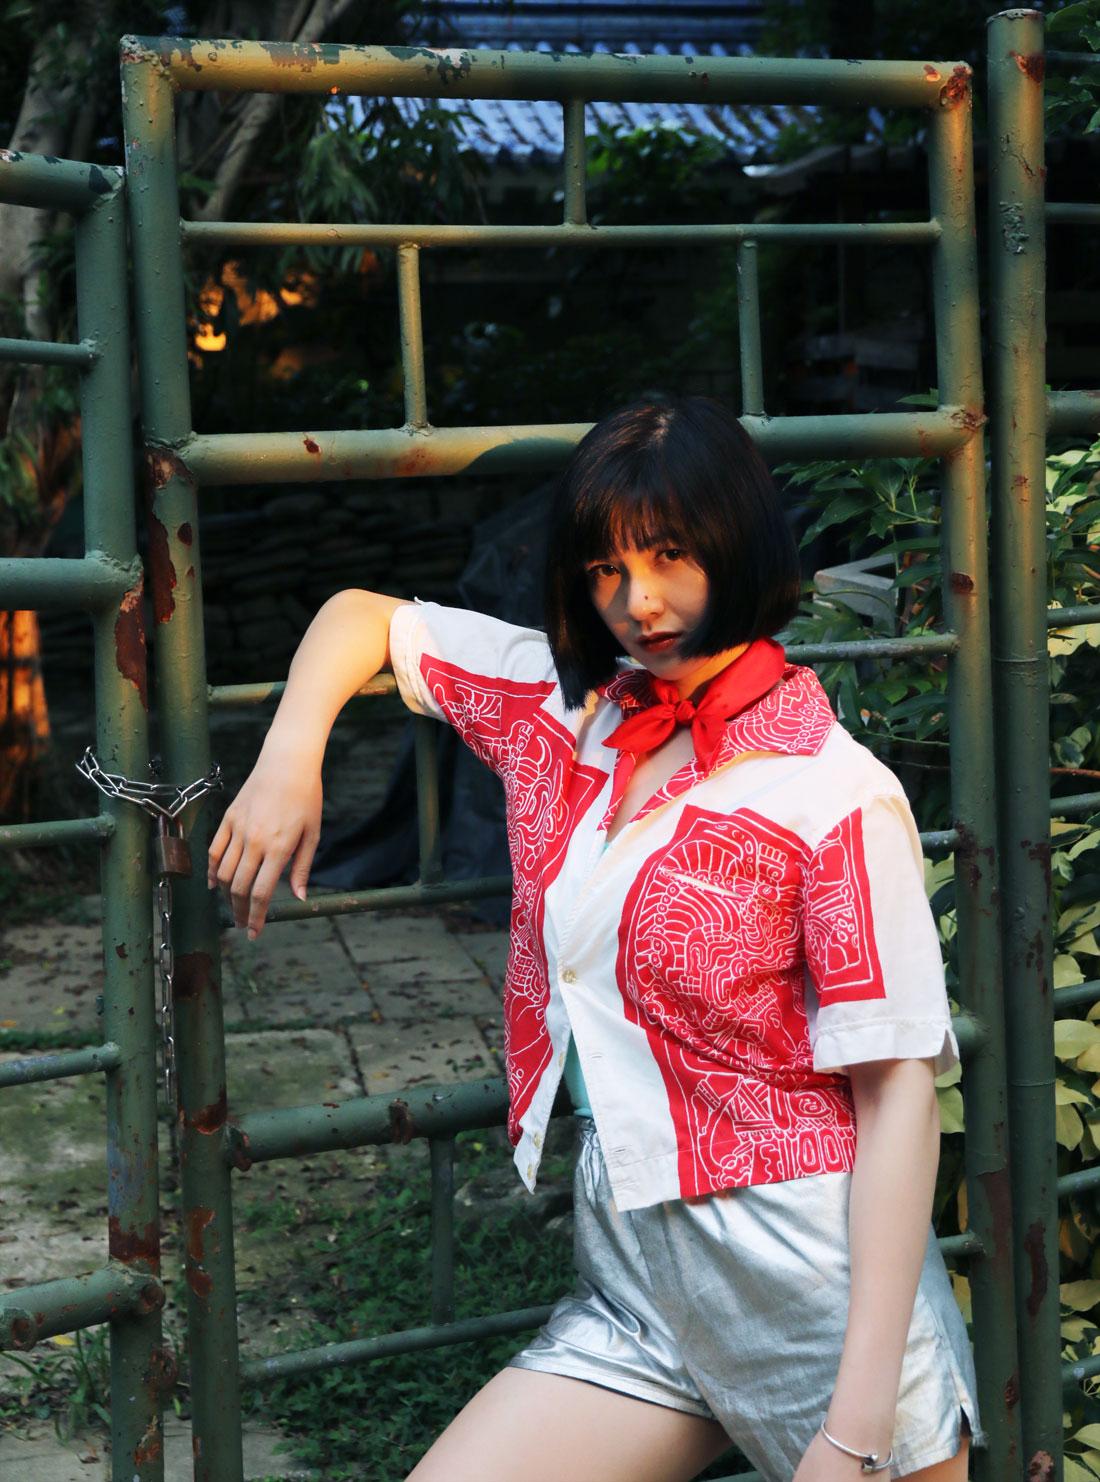 buy fashion red silk scarf online paris taipei tokyo isetan selfridges barneys new york